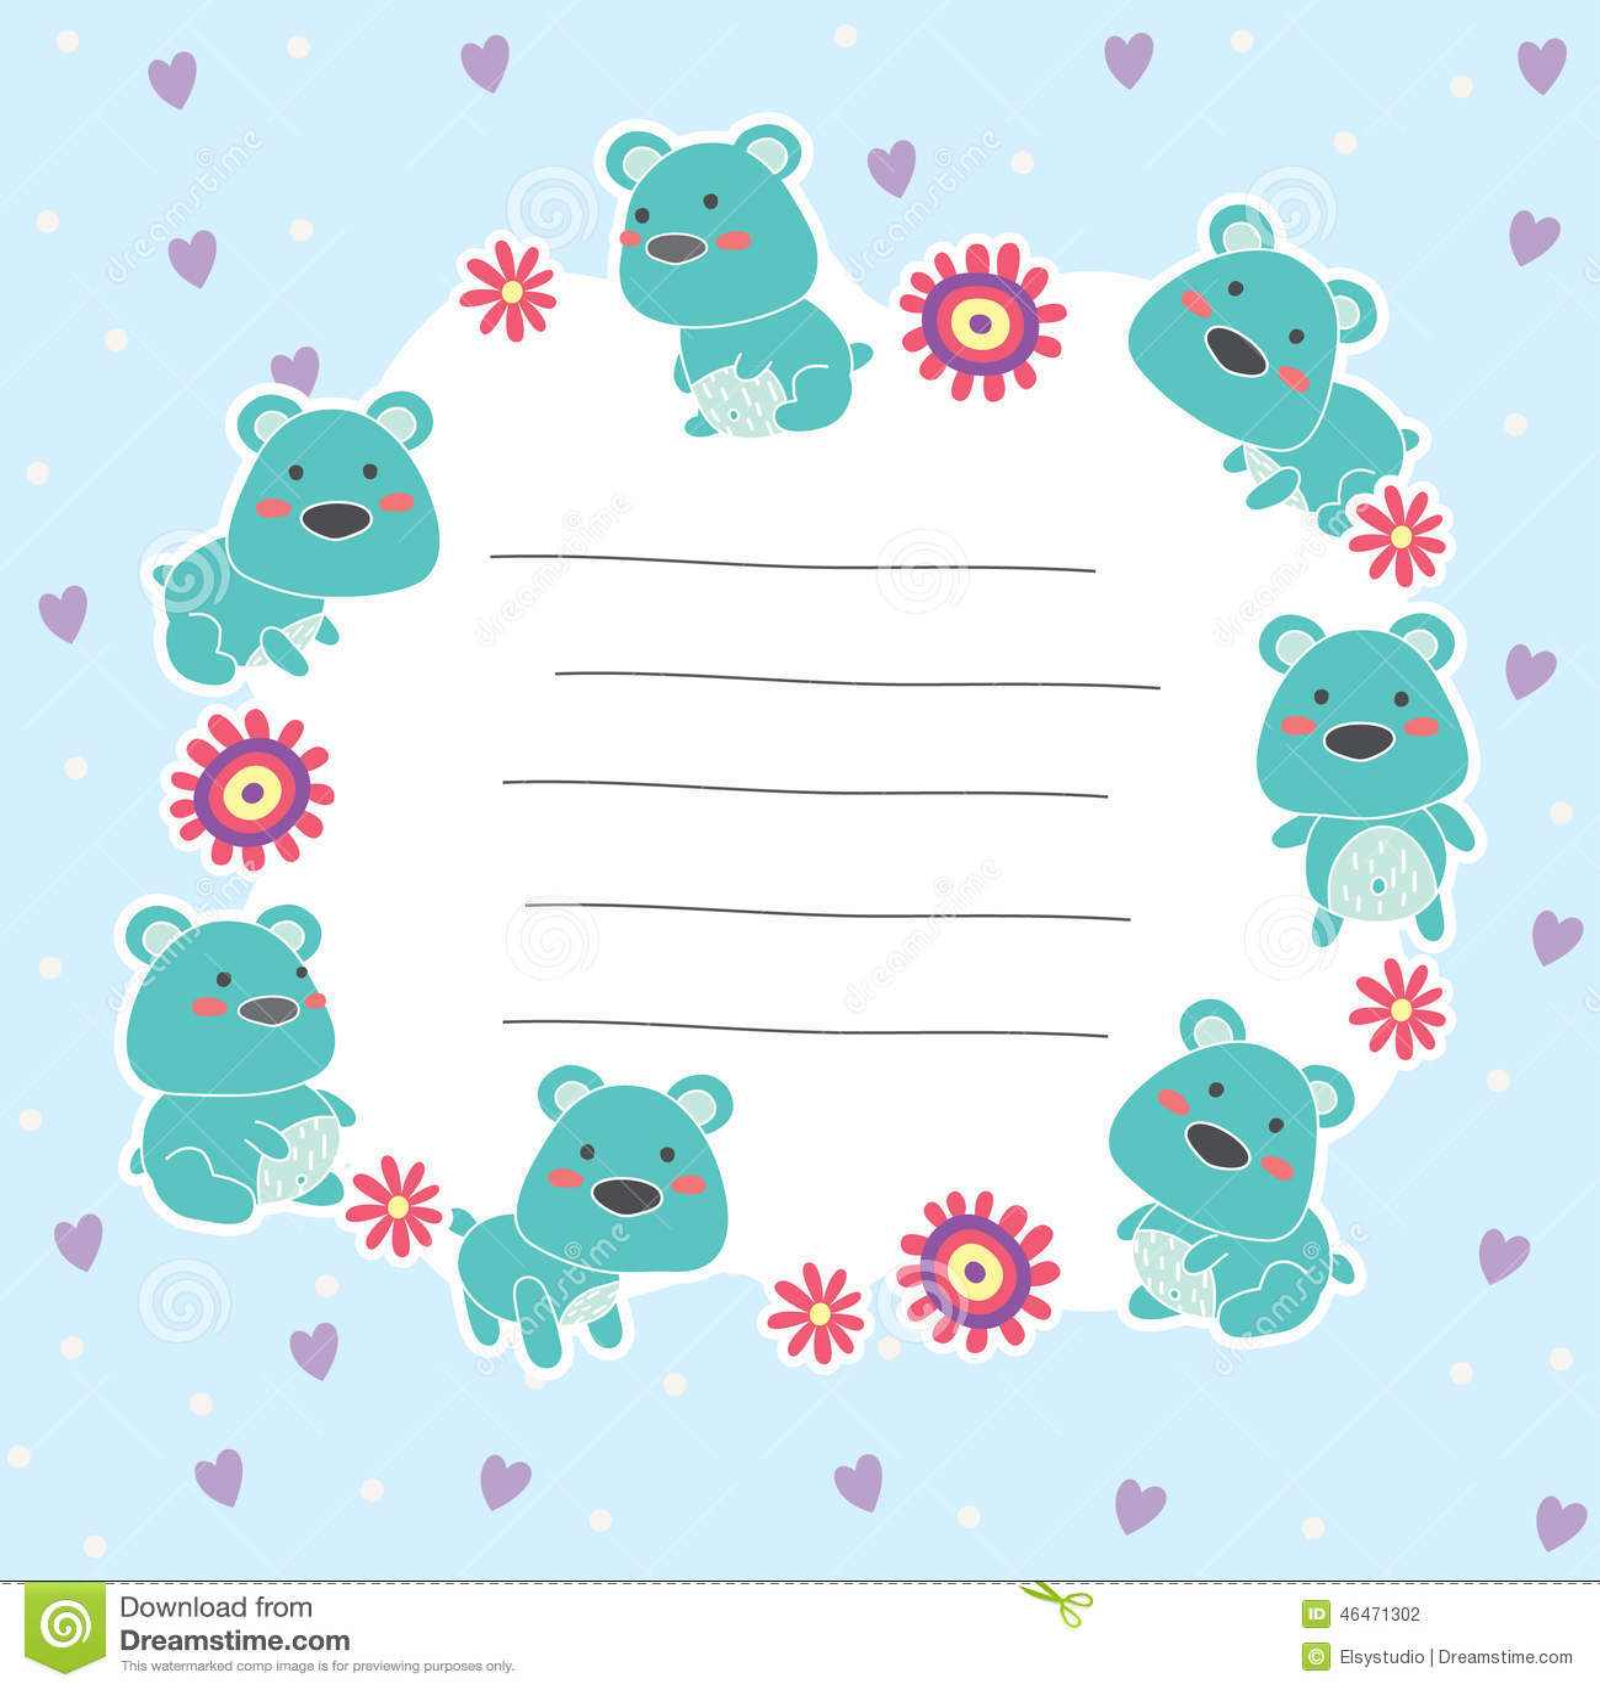 cute teddy bear memo layout design stock vector image 46471302 cute teddy bear memo layout design